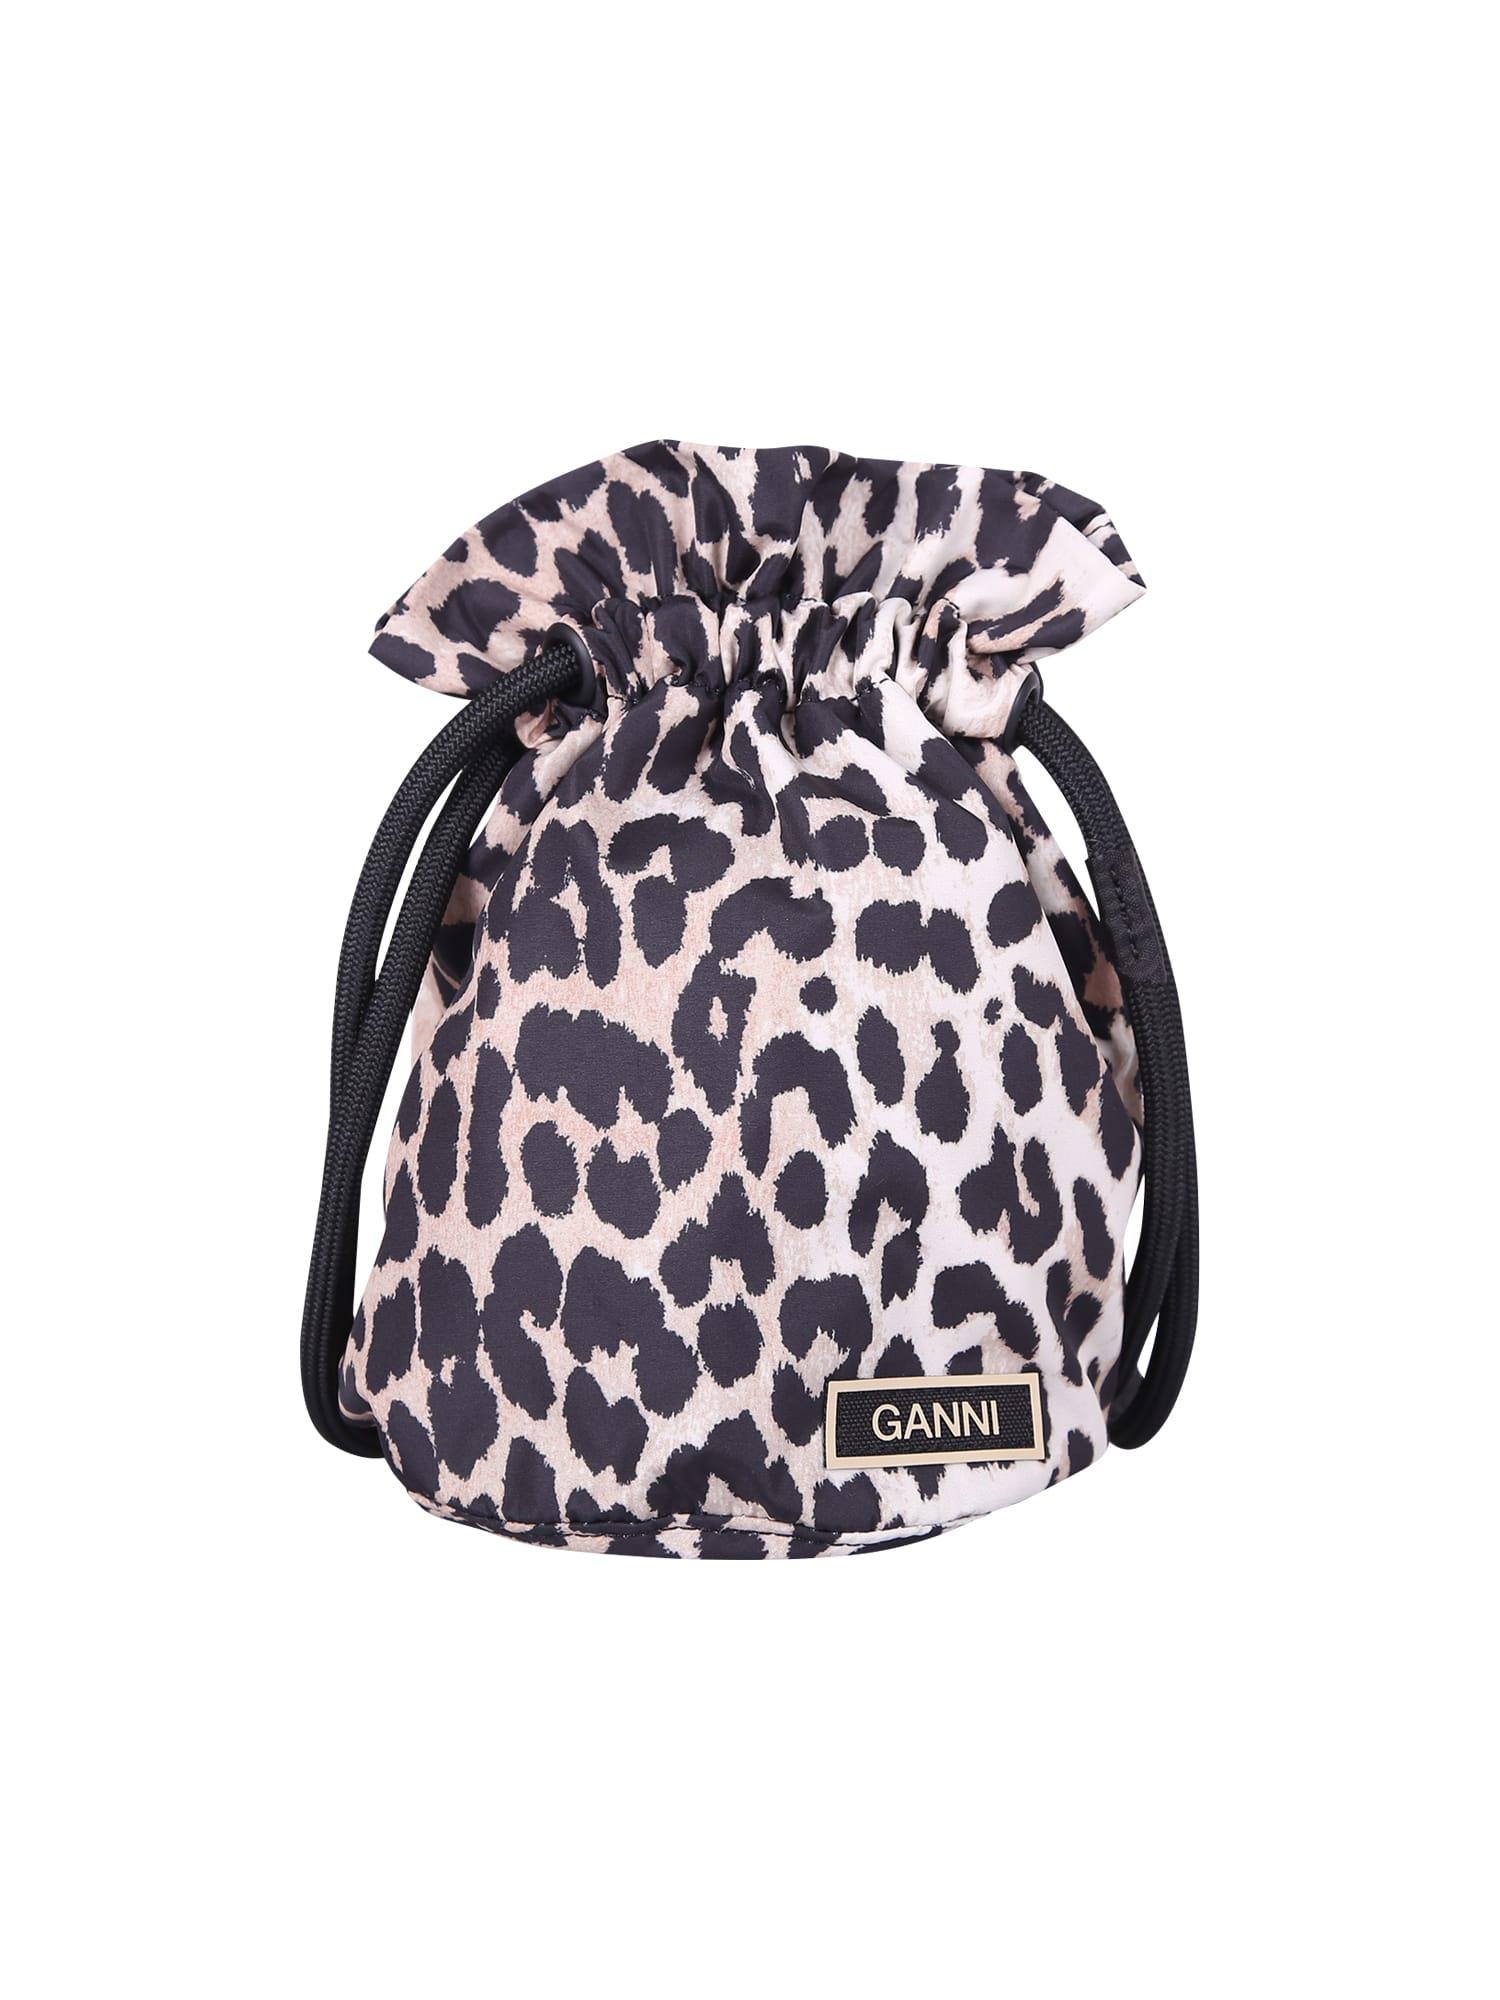 Ganni Bucket bags LEOPARD PRINT BAG